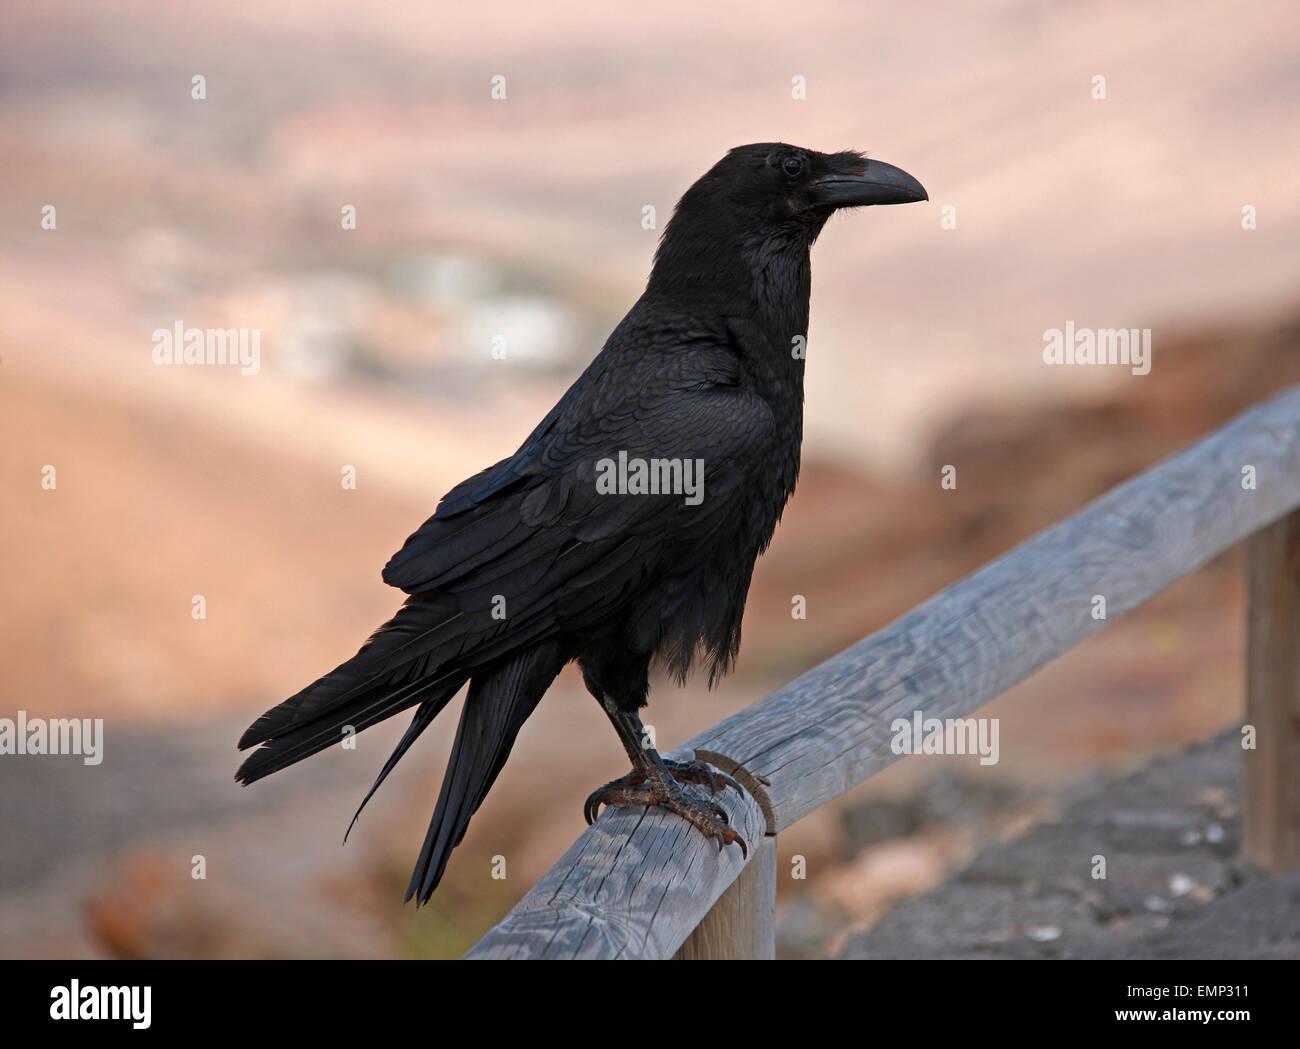 Kanarischen Inseln Rabe, Corvus Corax Jordansi (Sy C. c. Tingitanus), Rabenvögel. Stockbild